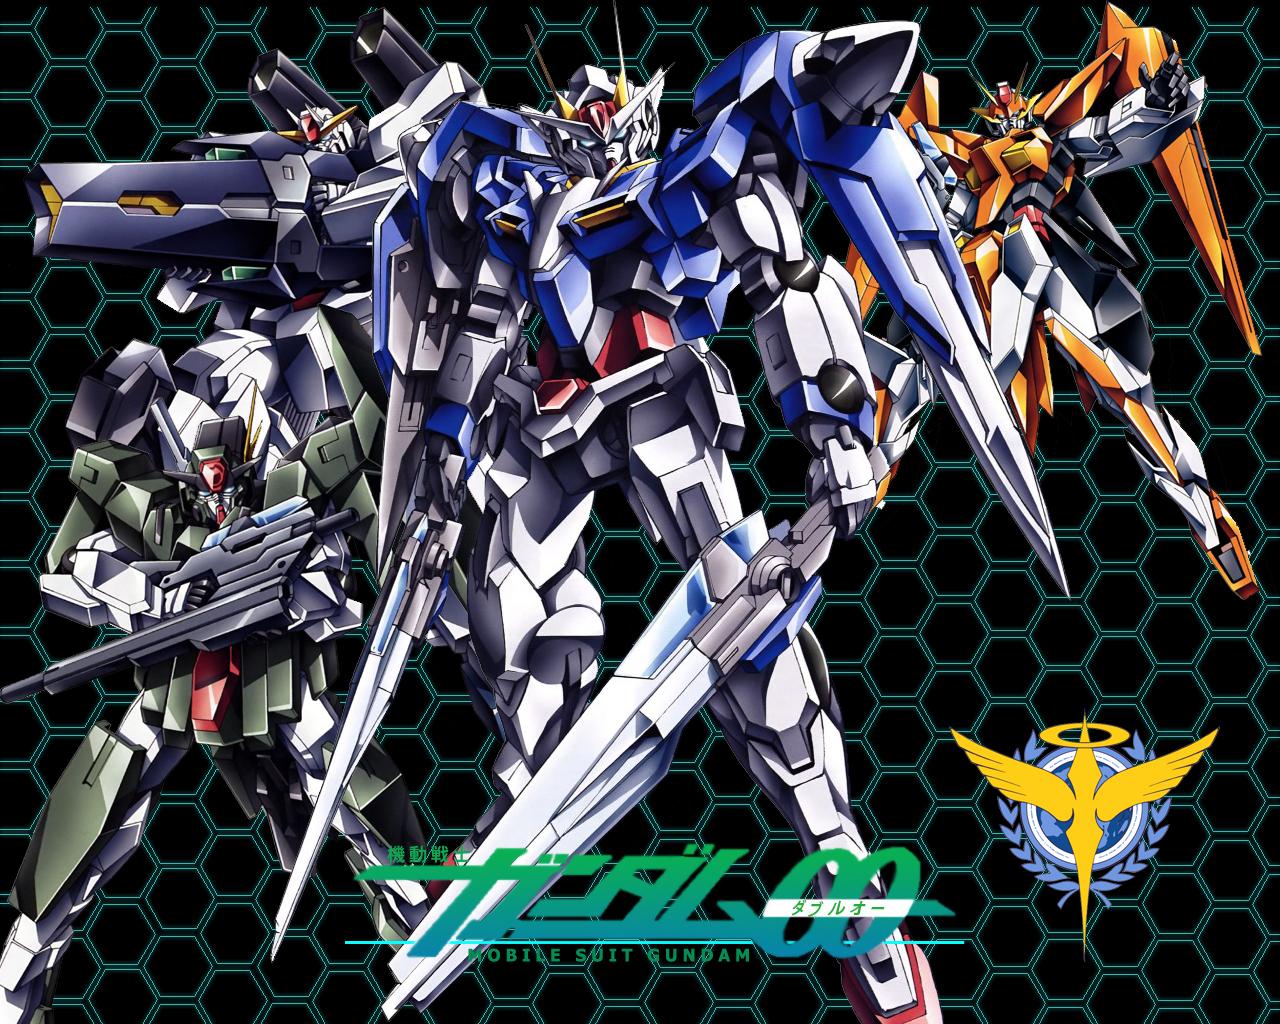 http://4.bp.blogspot.com/_n0ctwWWcABU/TR31ulGatPI/AAAAAAAAASs/9DhMnbHpA0I/s1600/Gundam_00_Season_2_Wallpaper_by_shinigami117.jpg